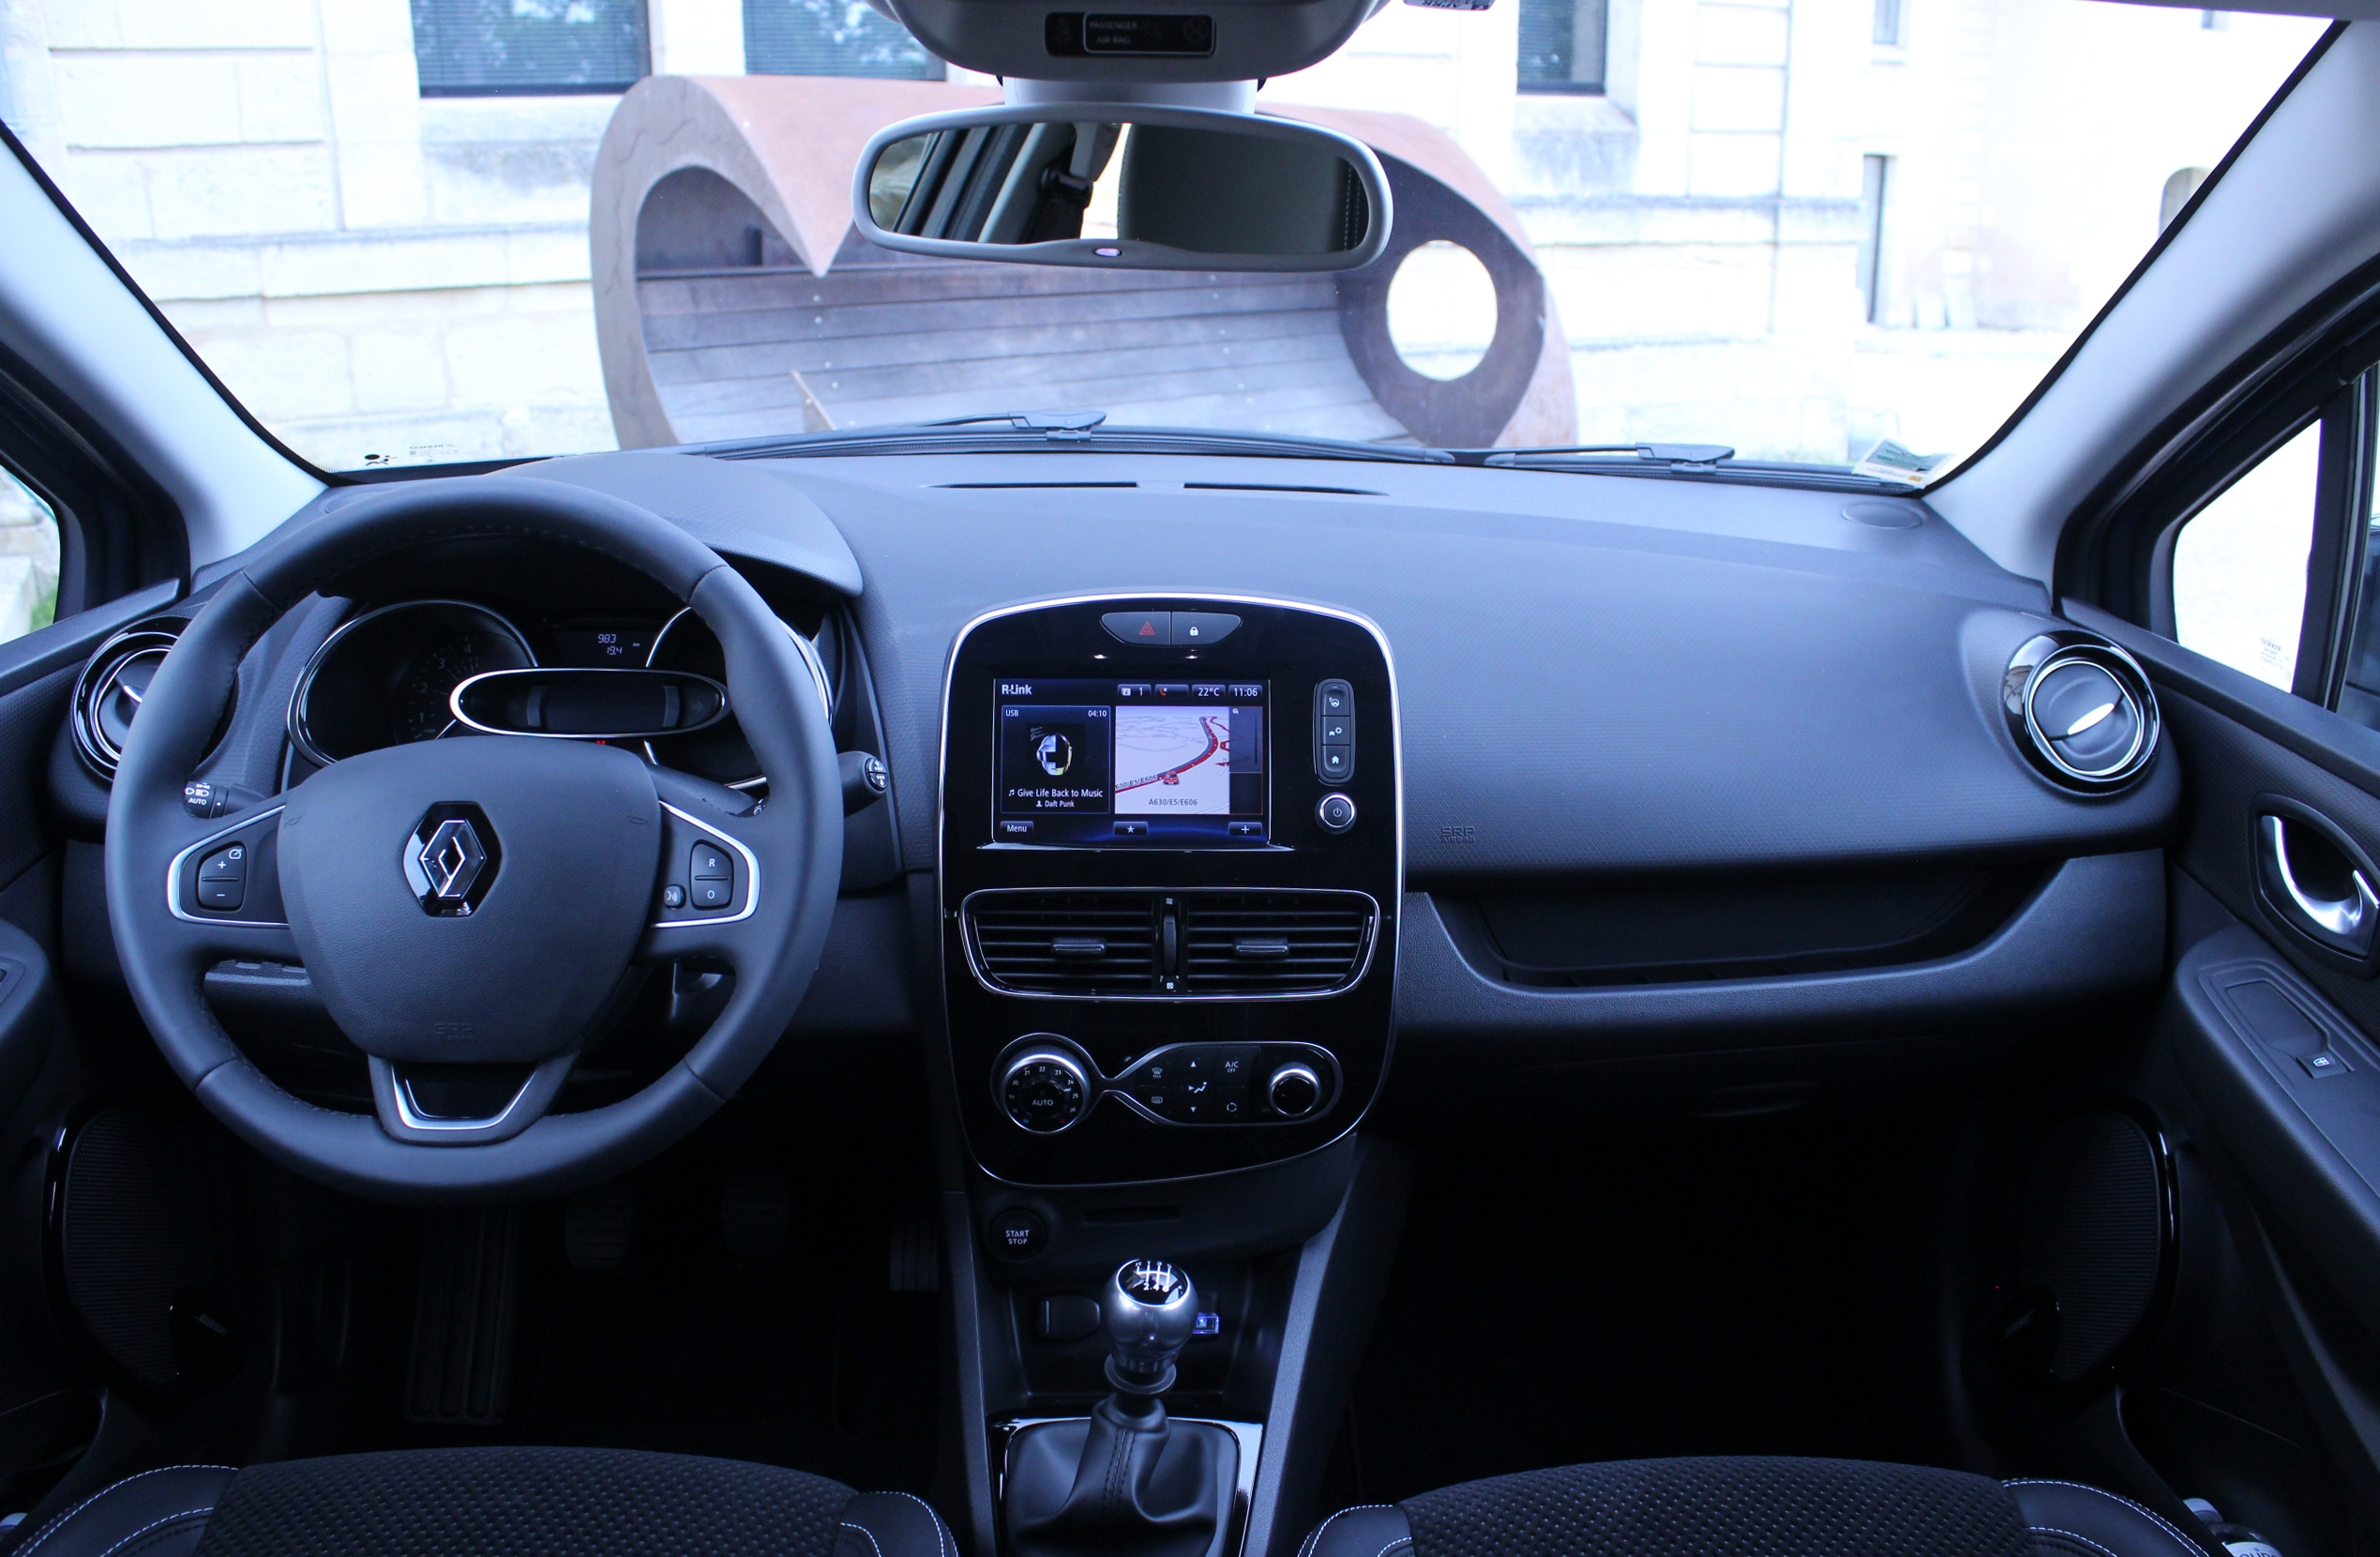 Renault clio 4 interieur 28 images essai vid 233 o for Clio 4 interieur rouge